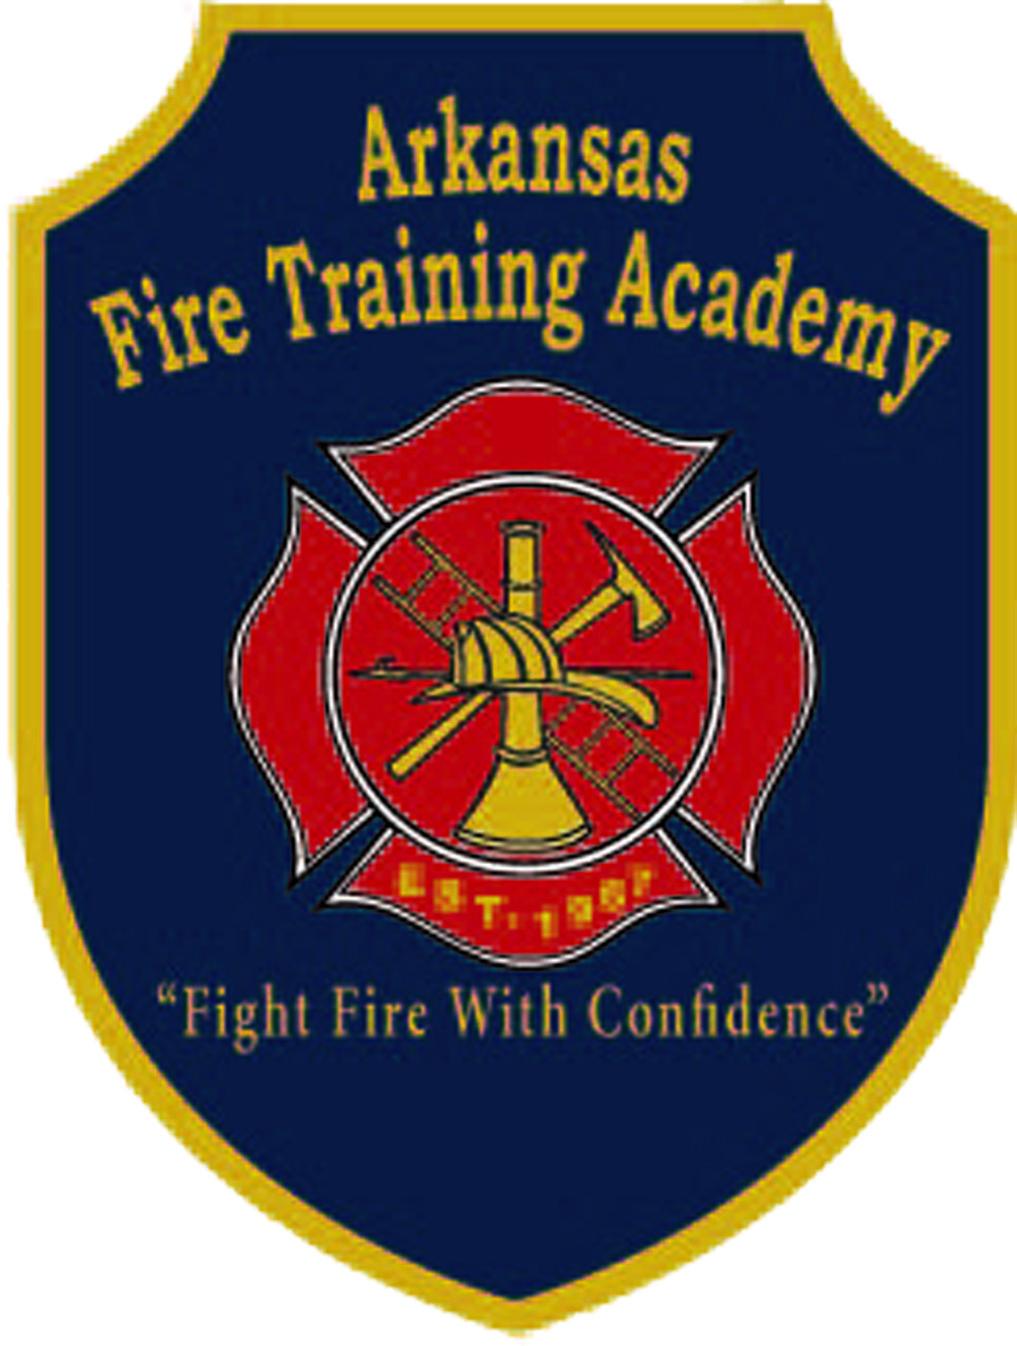 logo for the Arkansas Fire Training Academy